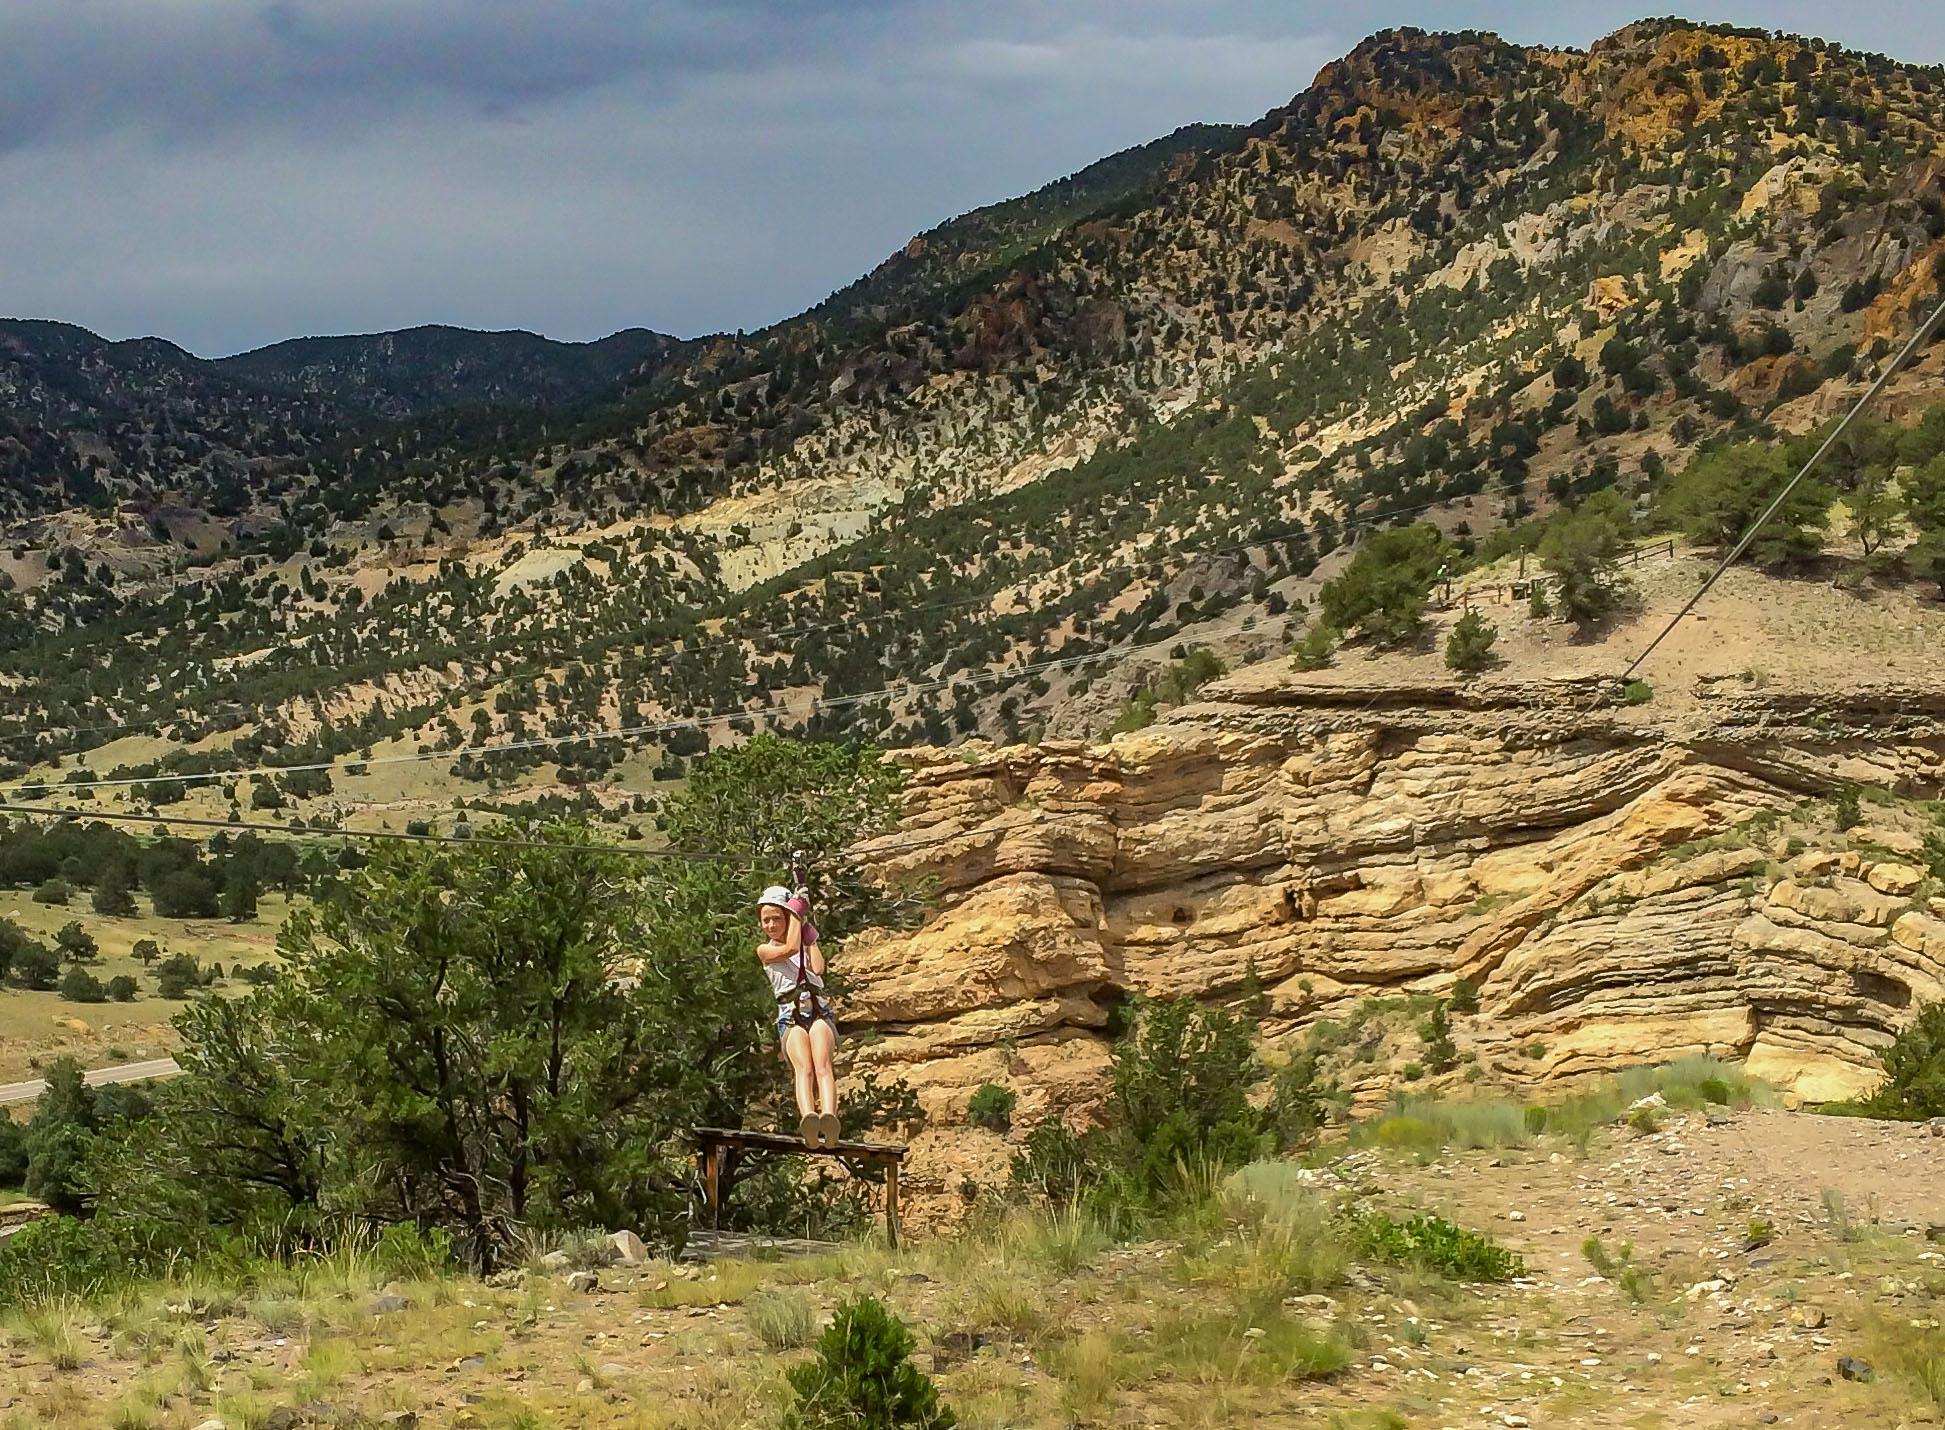 Little MK, big canyon.